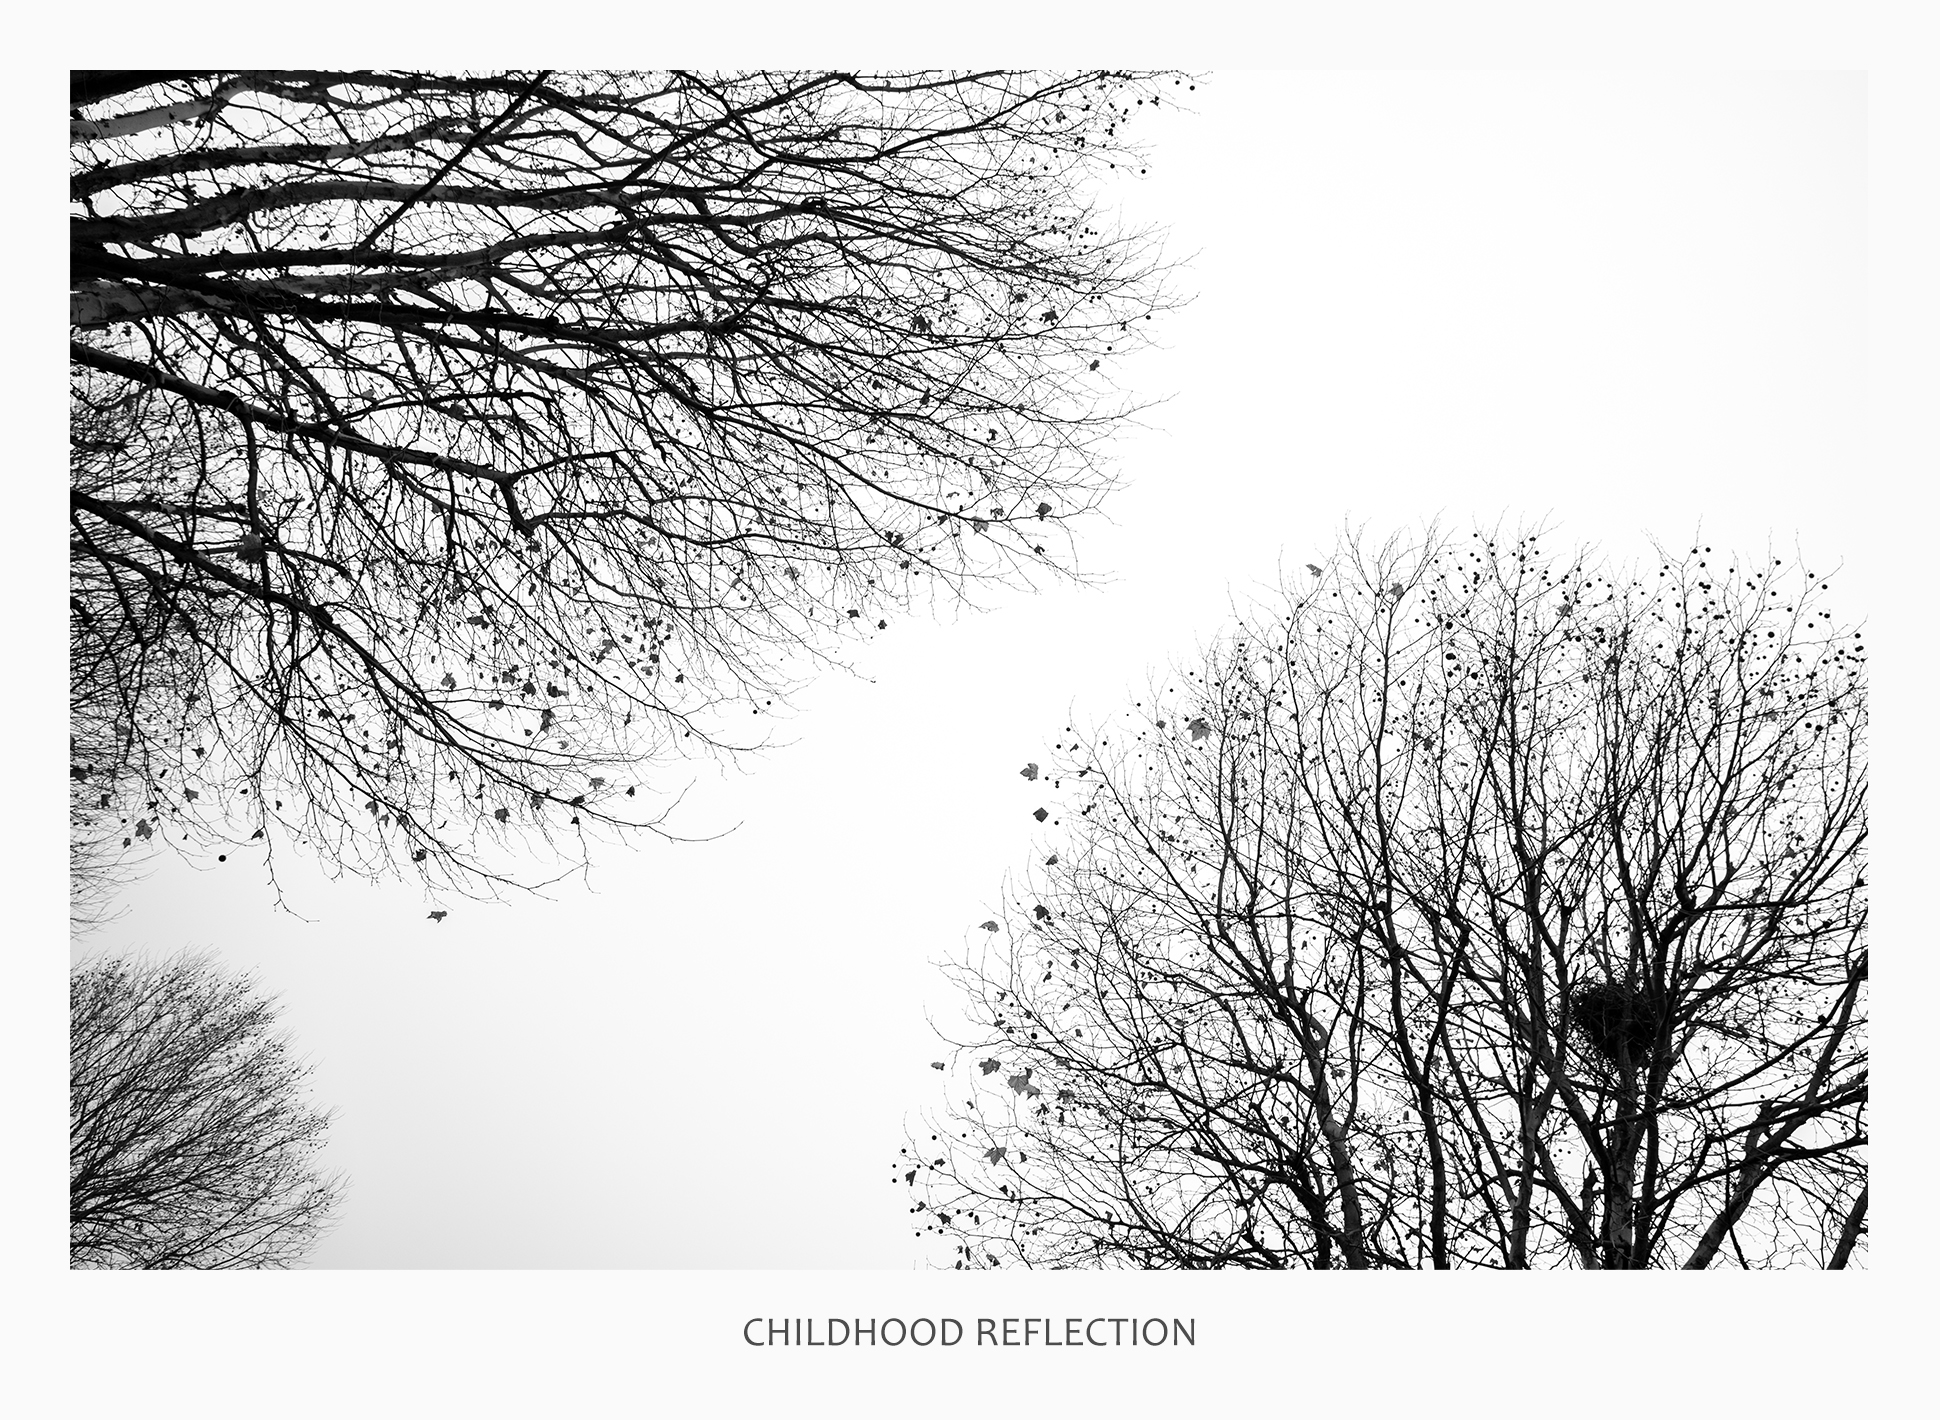 03 43677 - Childhood Reflection